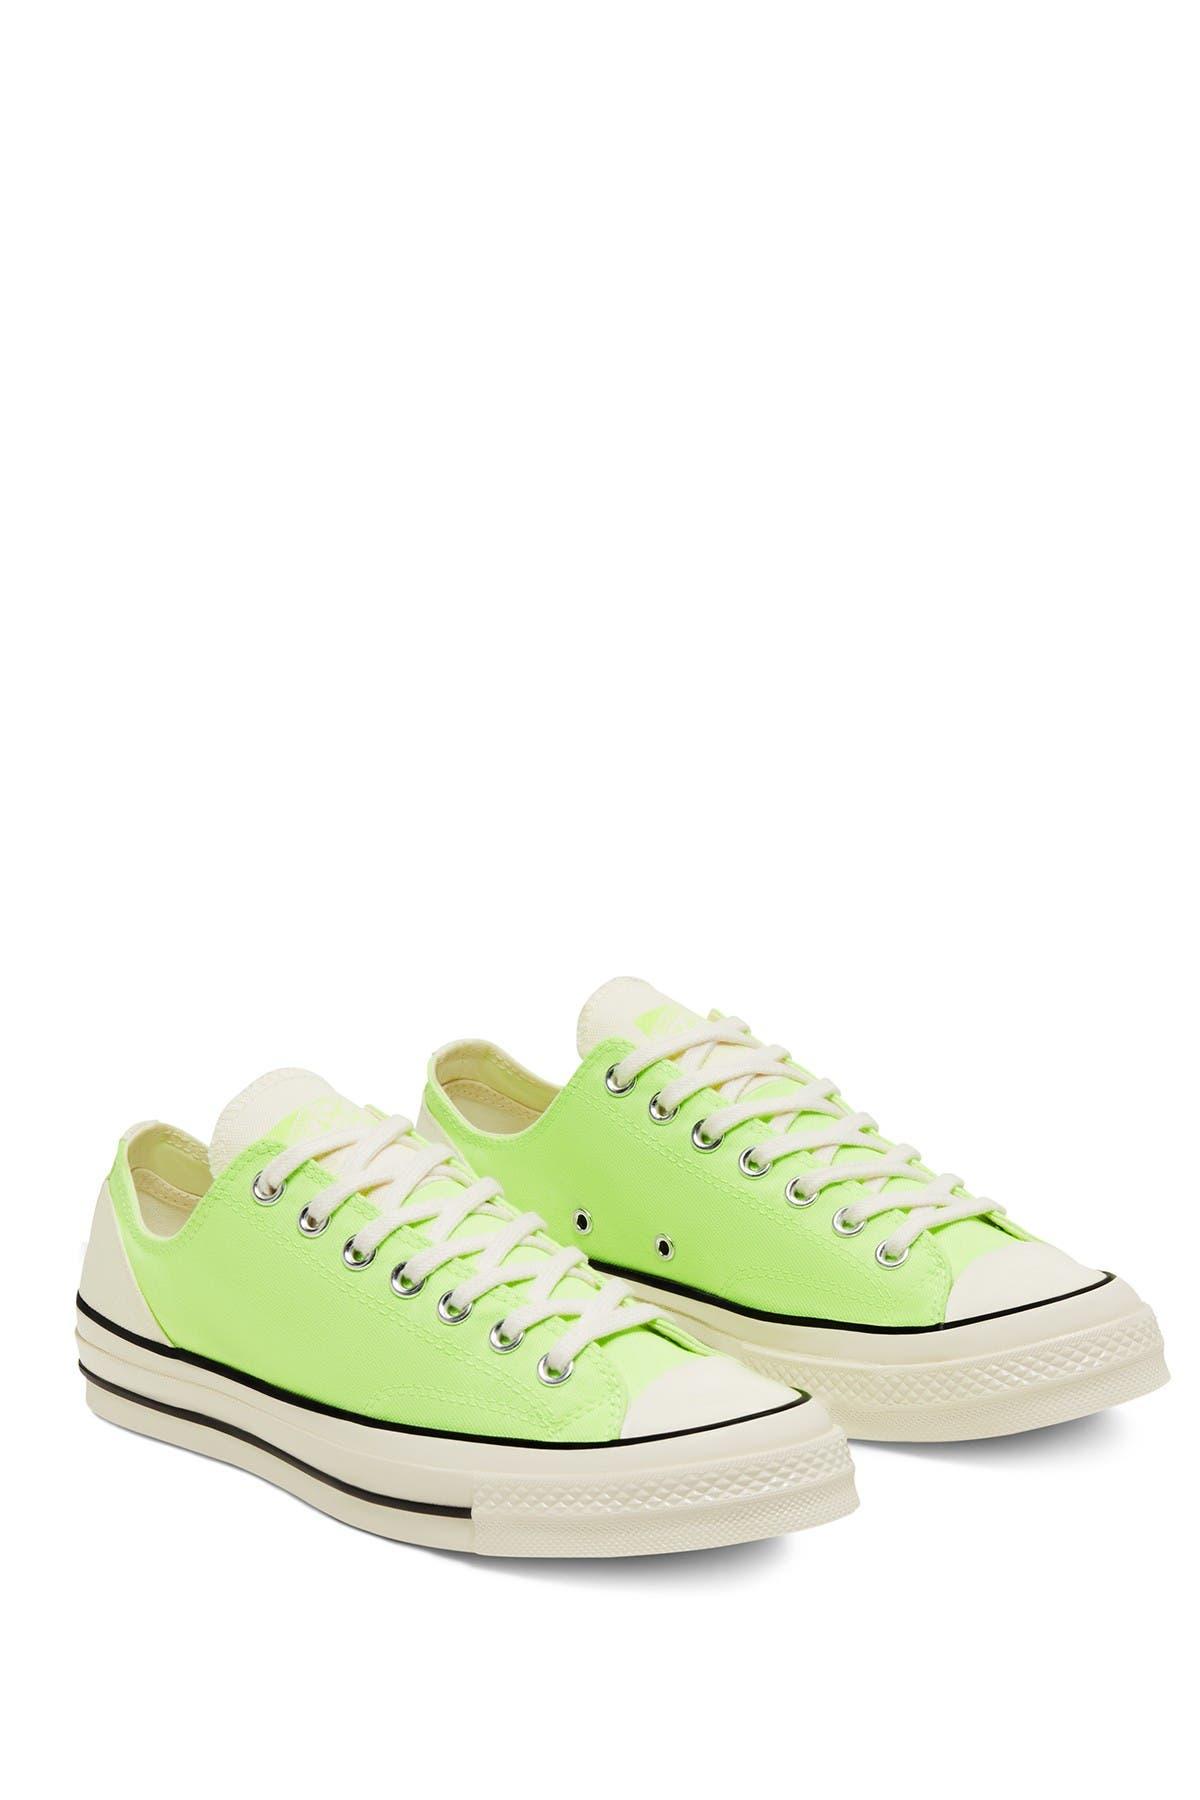 Image of Converse Chuck 70 Oxford Sneaker